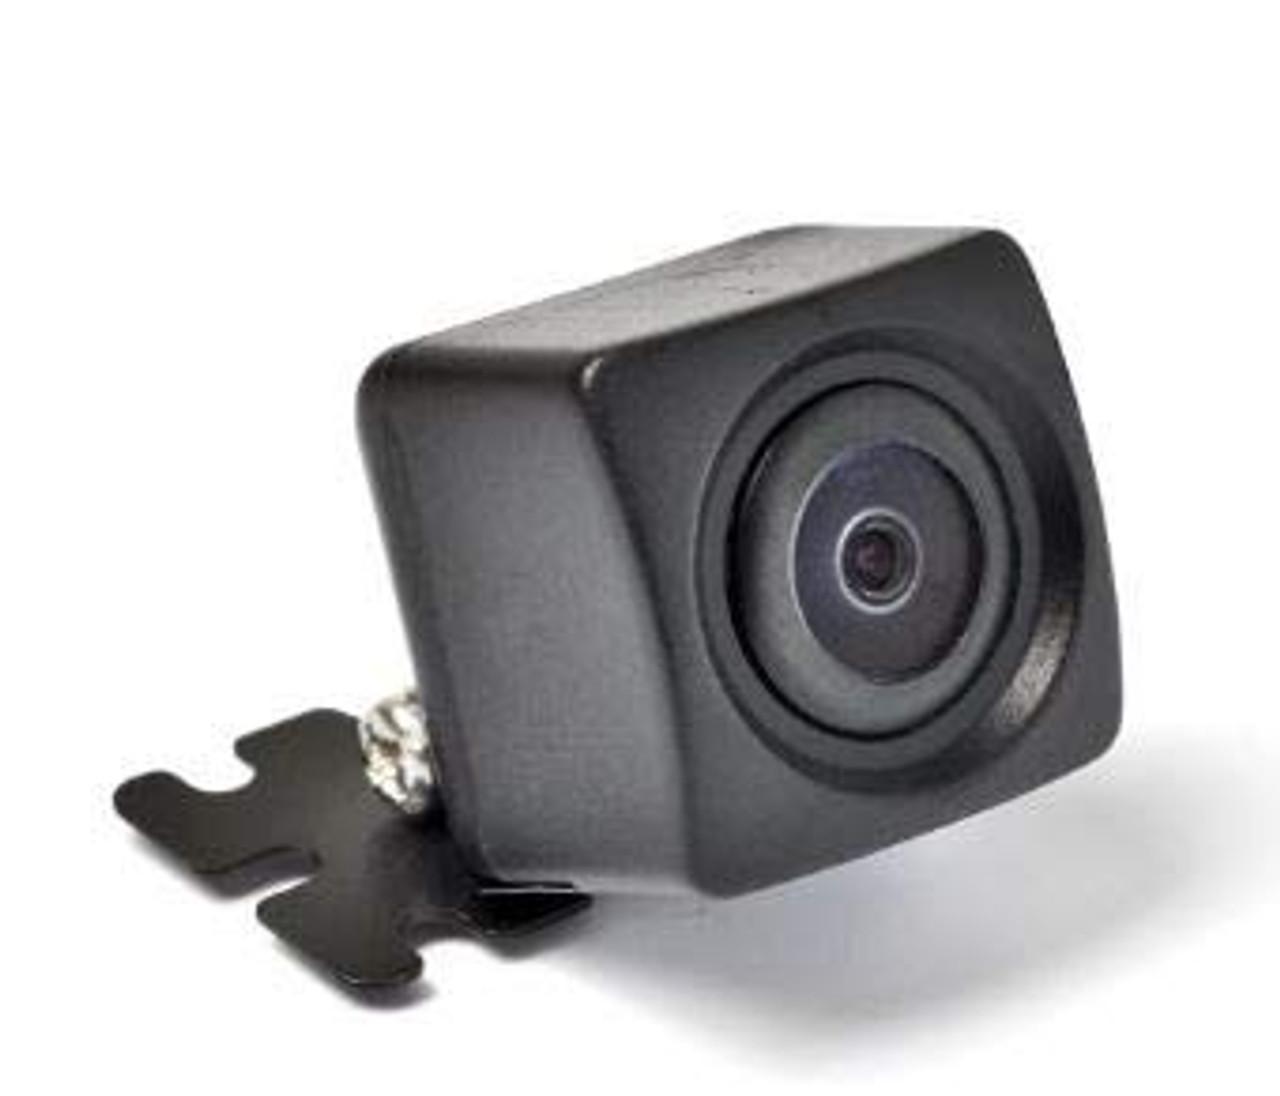 Surface Mount Backup Camera (RVS-776)